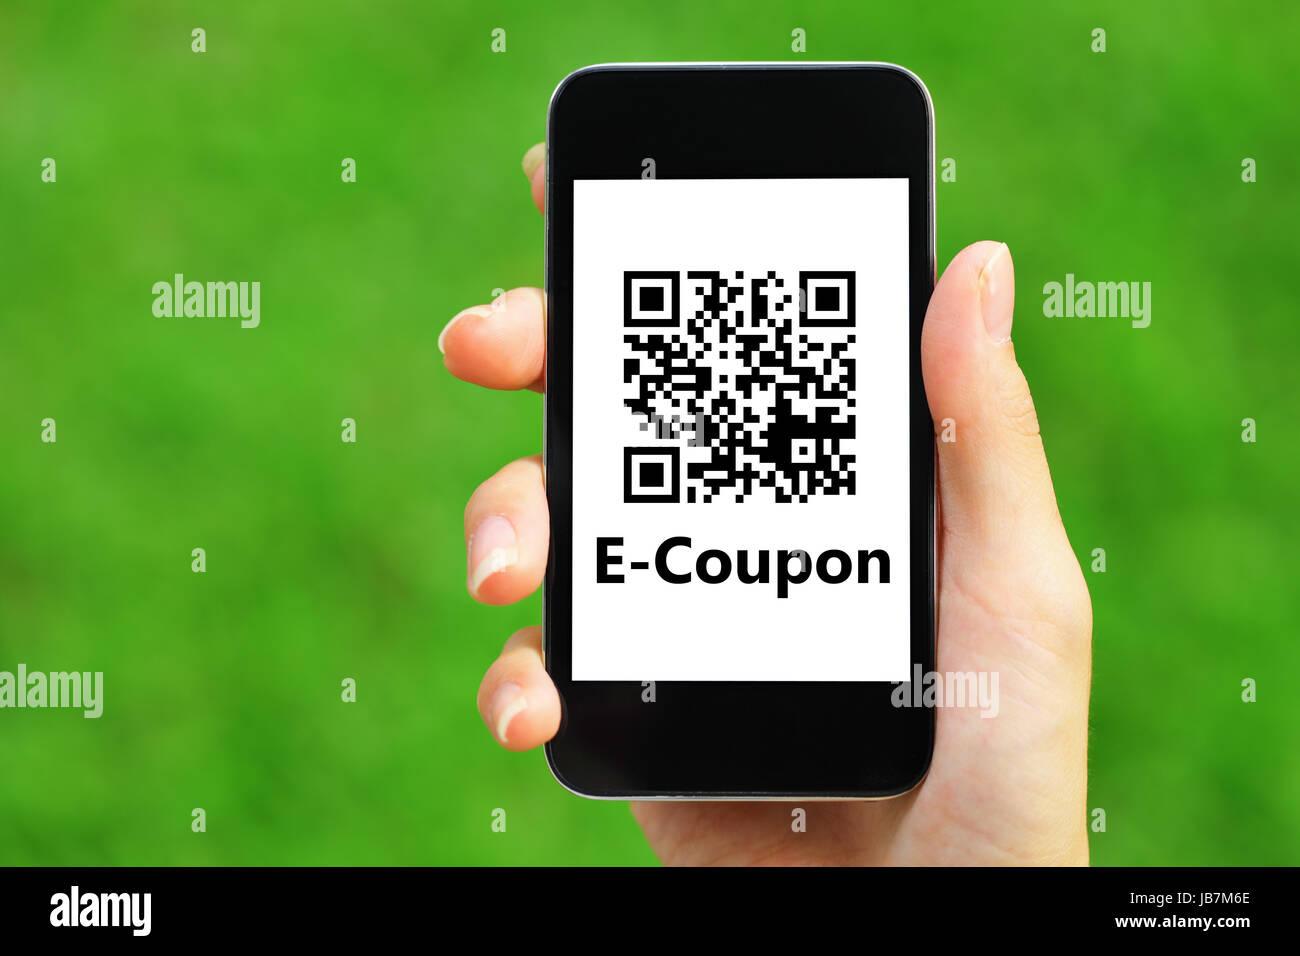 Coupon Qr Code On Smart Phone Stock Photo 144613686 Alamy